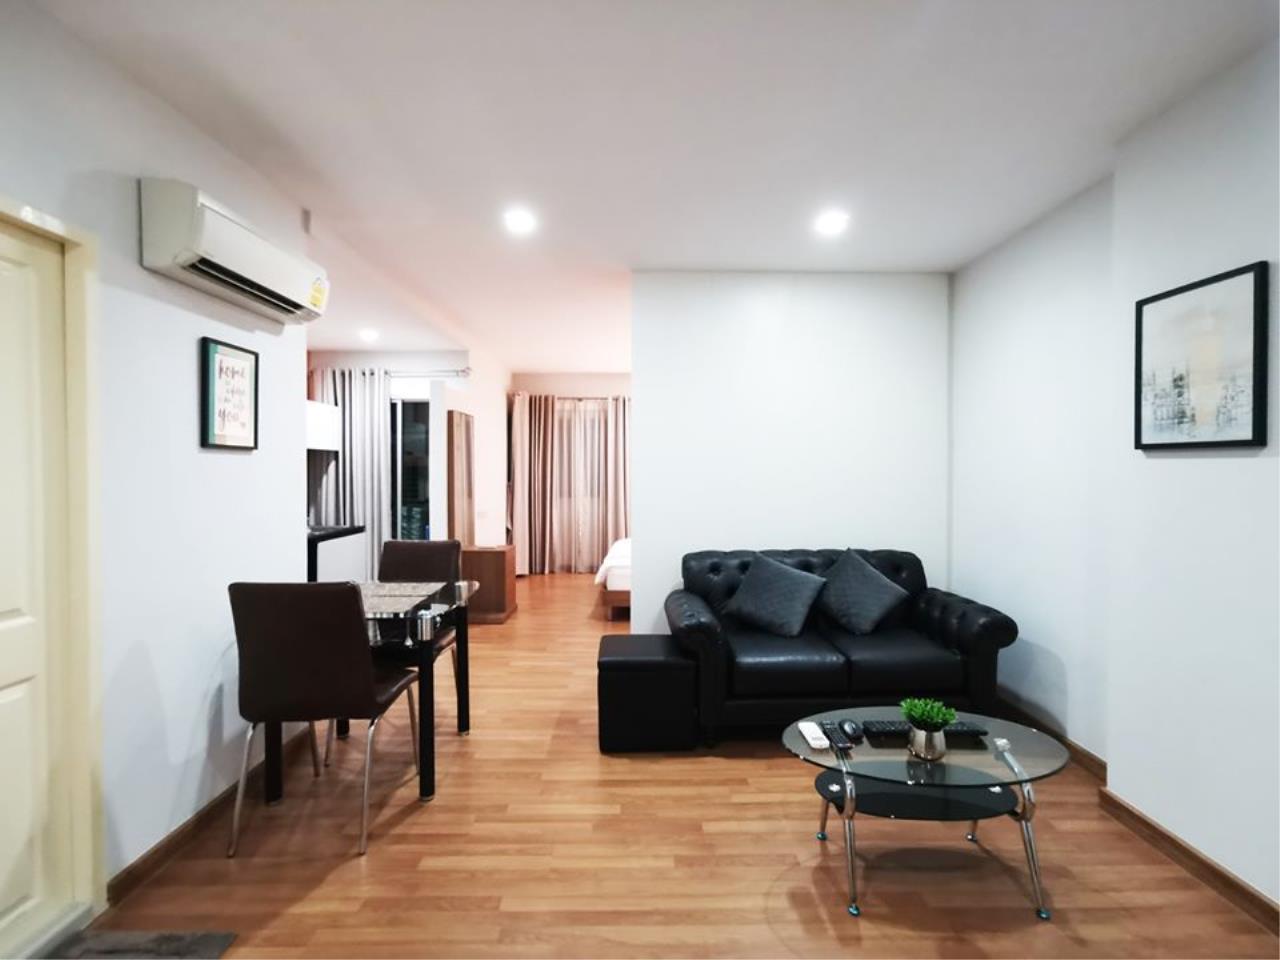 ☘️ให้เช่าคอนโด #PPPlus #Sukhumvit 71☘️ ห้อง Studio ขนาด 417 ตรม ชั้น 4 ระเบียงทิศตะวันออก วิวสระว่ายน้ำอาคาร Condo For R